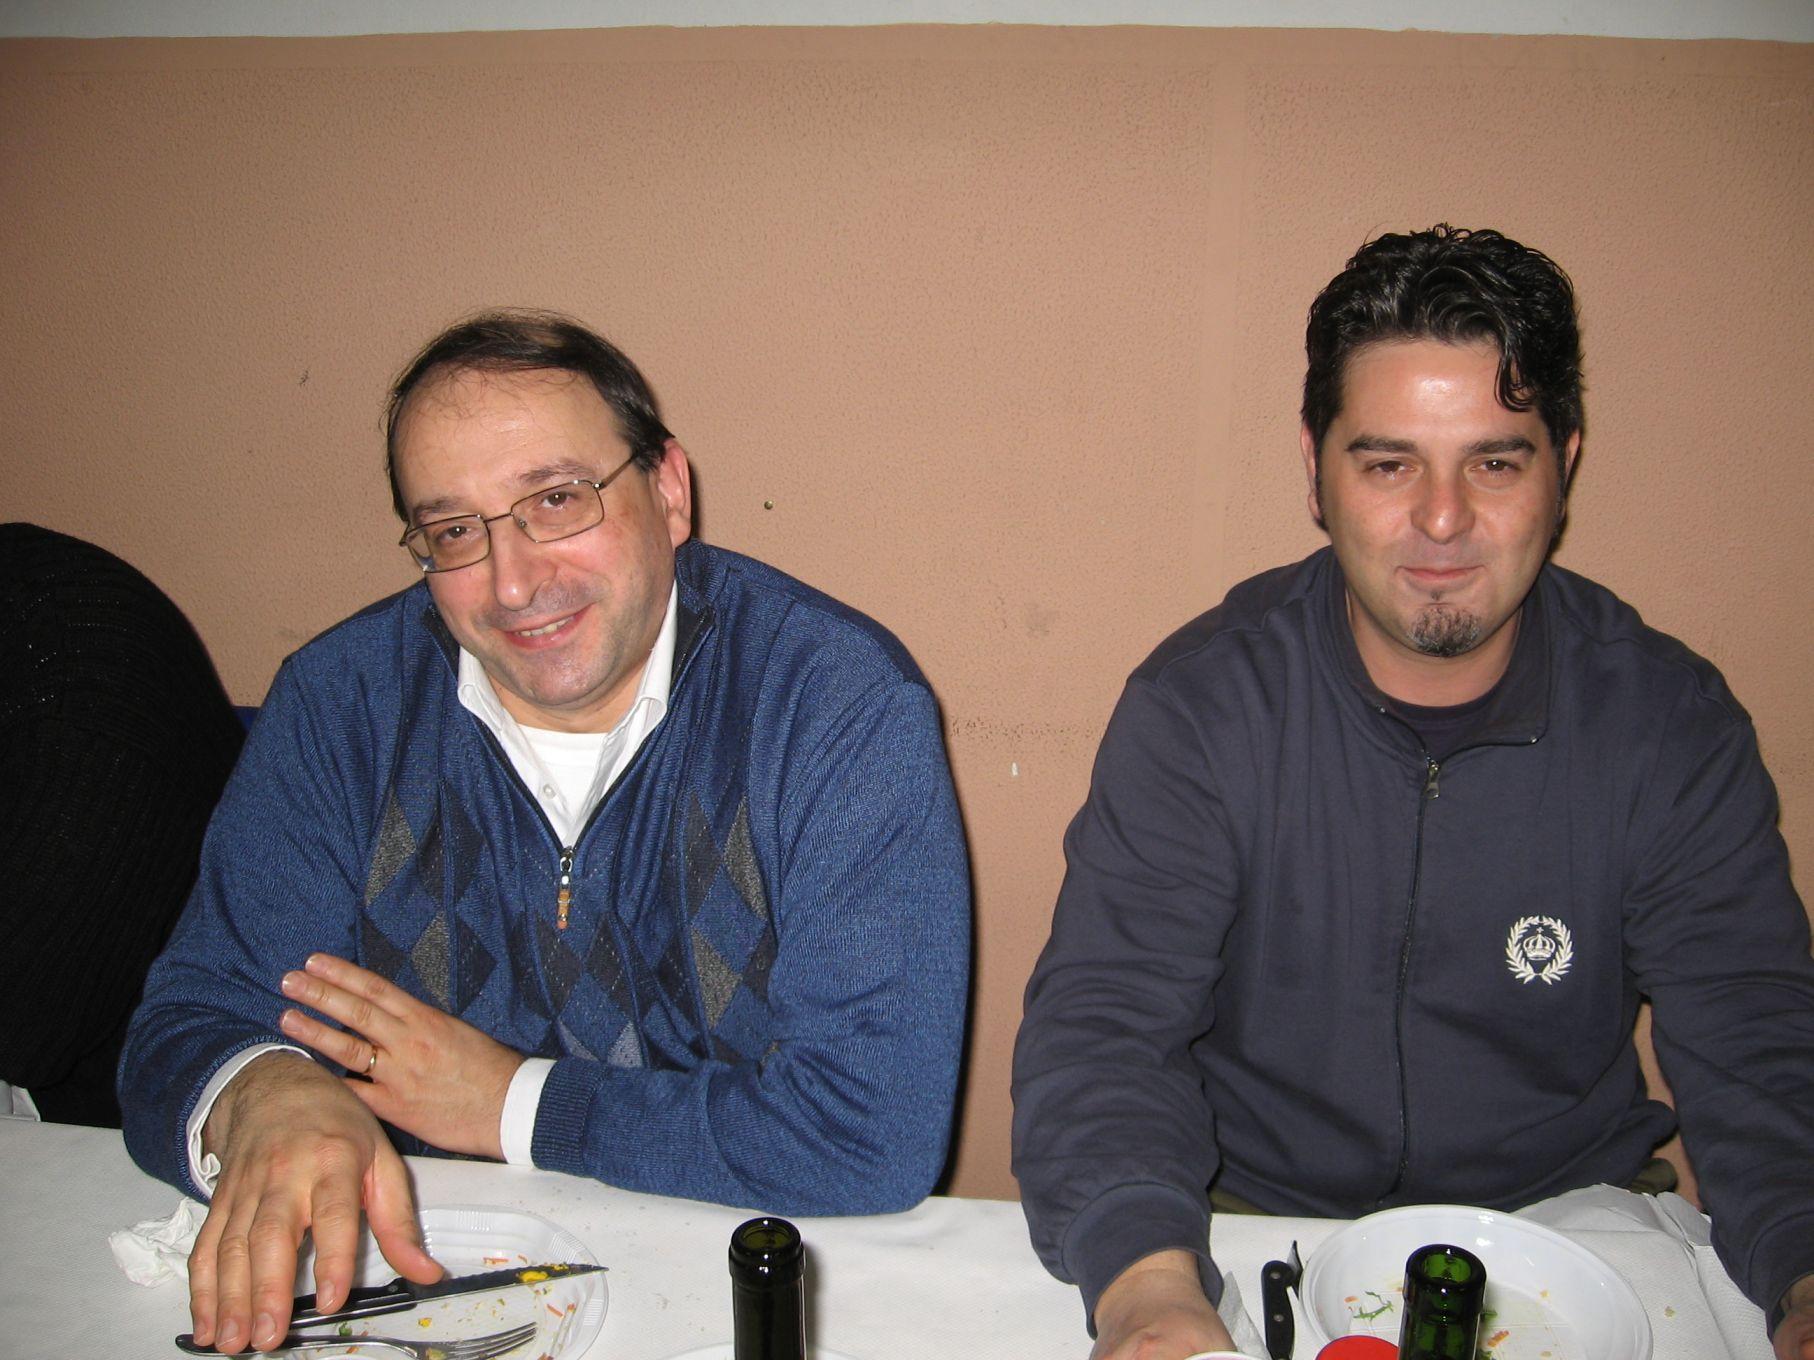 Cena_Famiglie_Comunione-2009-02-07--21.18.38.jpg